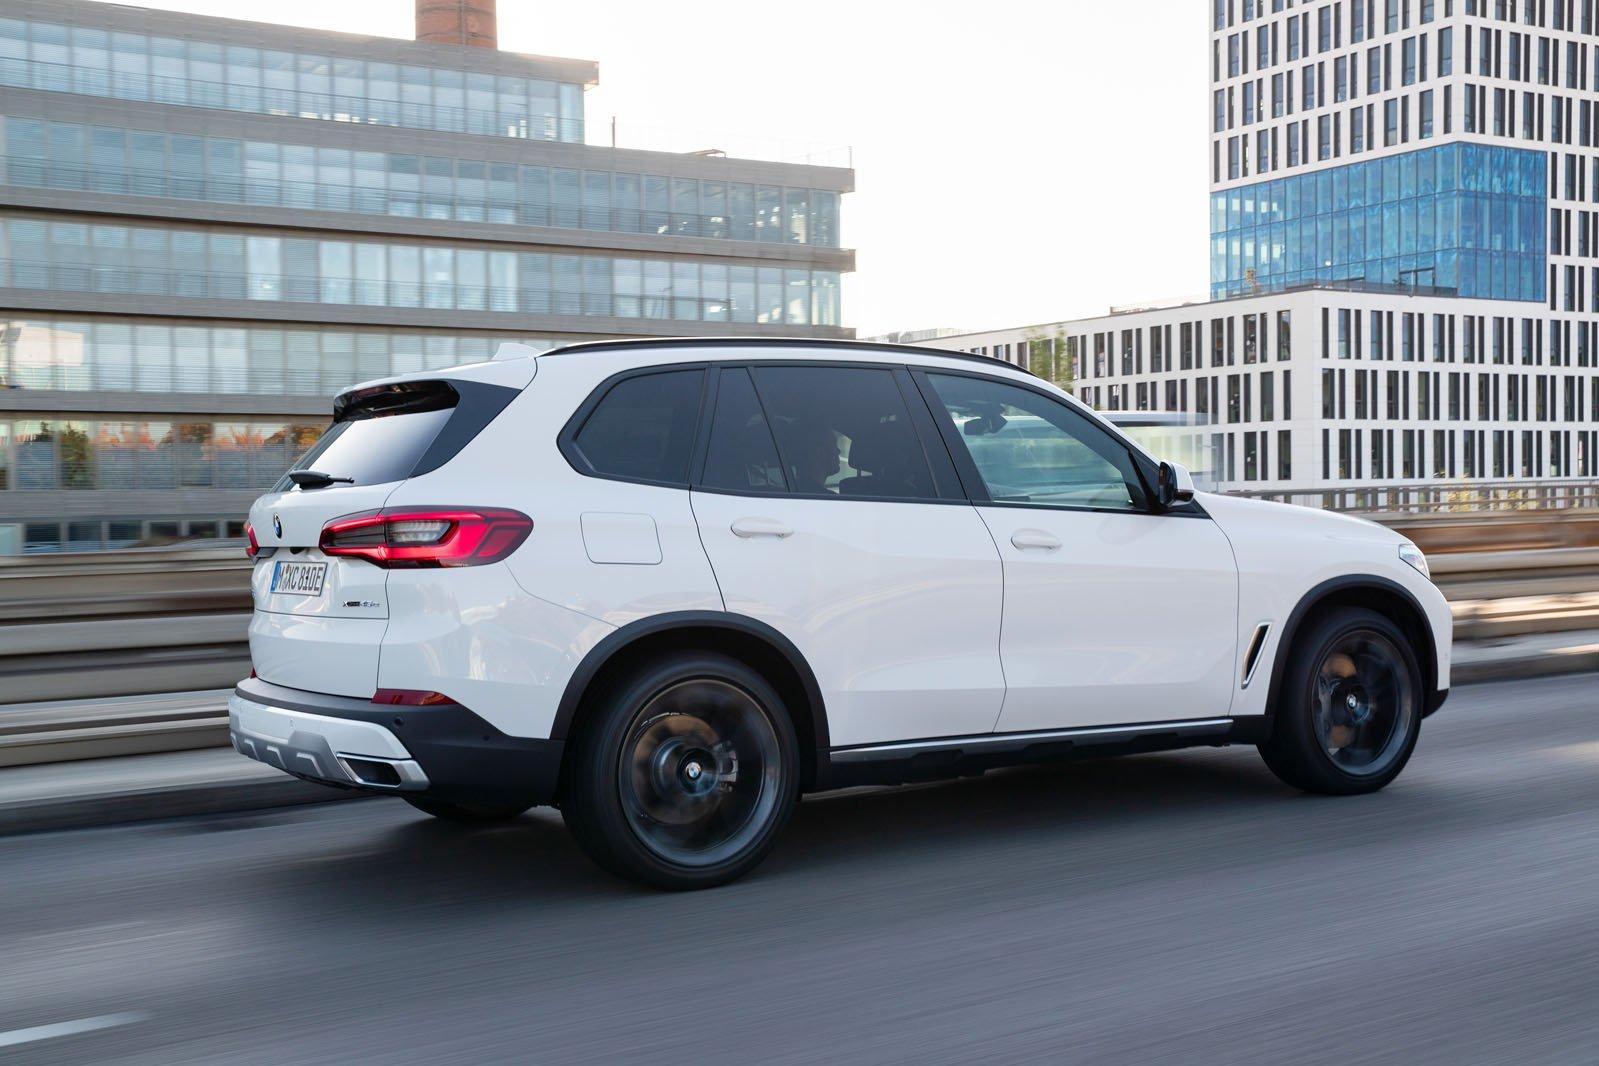 BMW X5 xDrive45e PHEV 2019 LHD rear right tracking